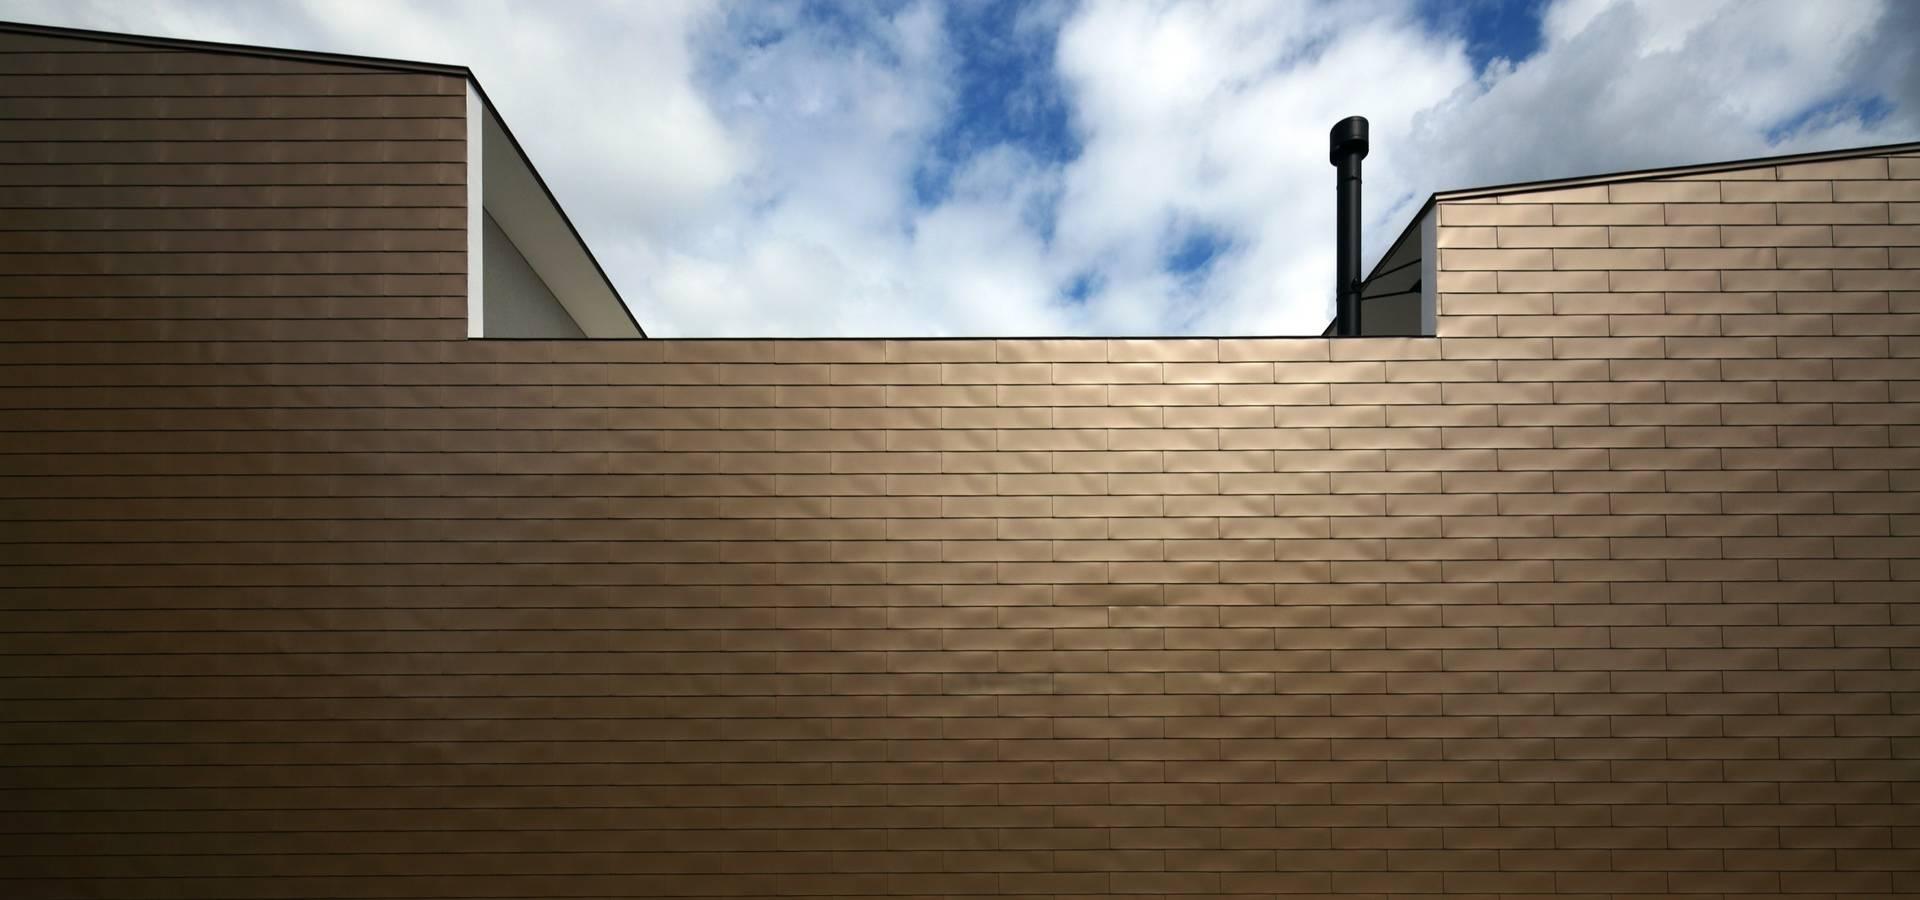 半谷彰英建築設計事務所/Akihide Hanya Architect & Associates